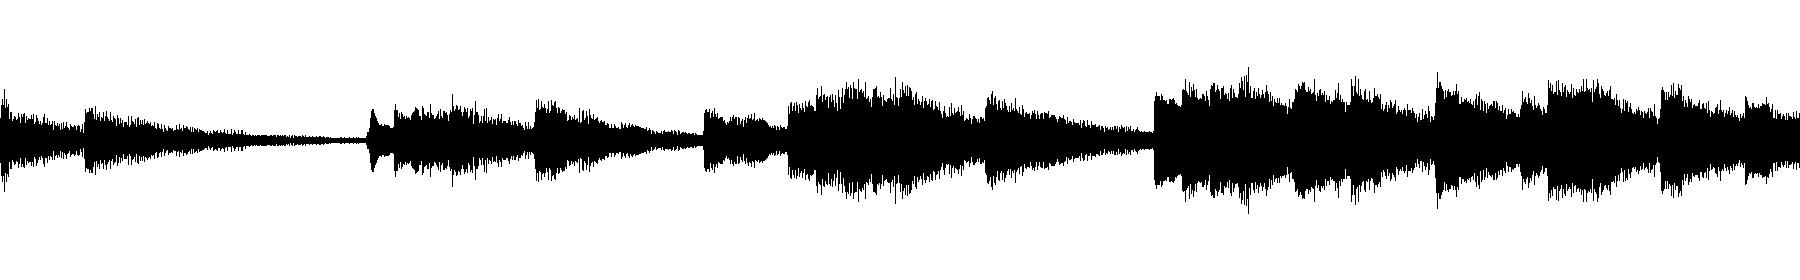 dts chordlp 23a cm wet